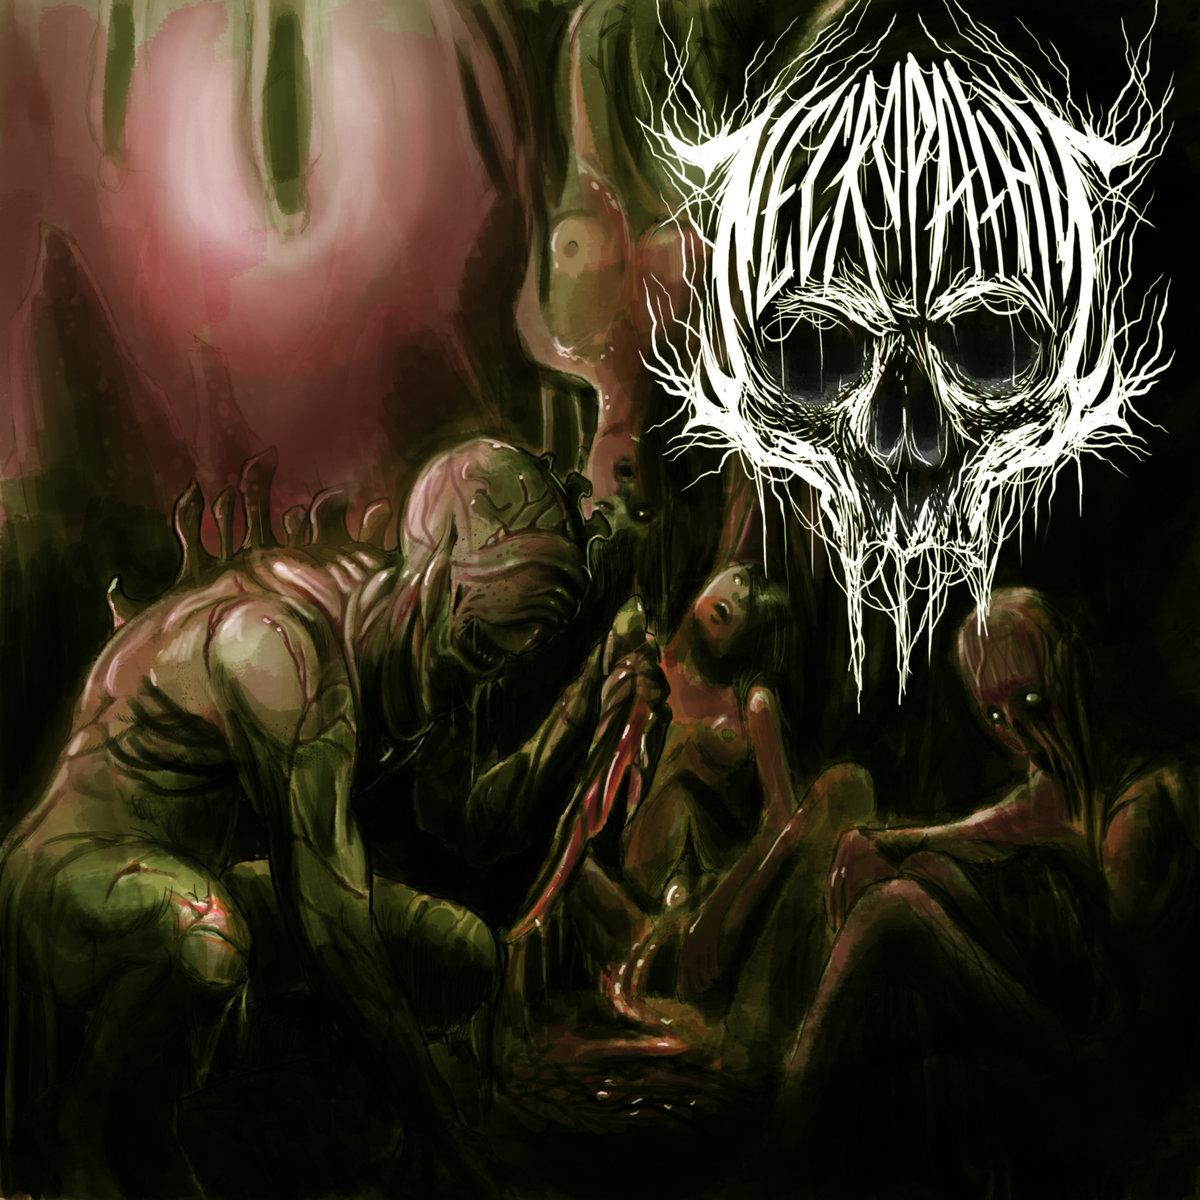 Necropathy - Infinite Depravity [single] (2019)